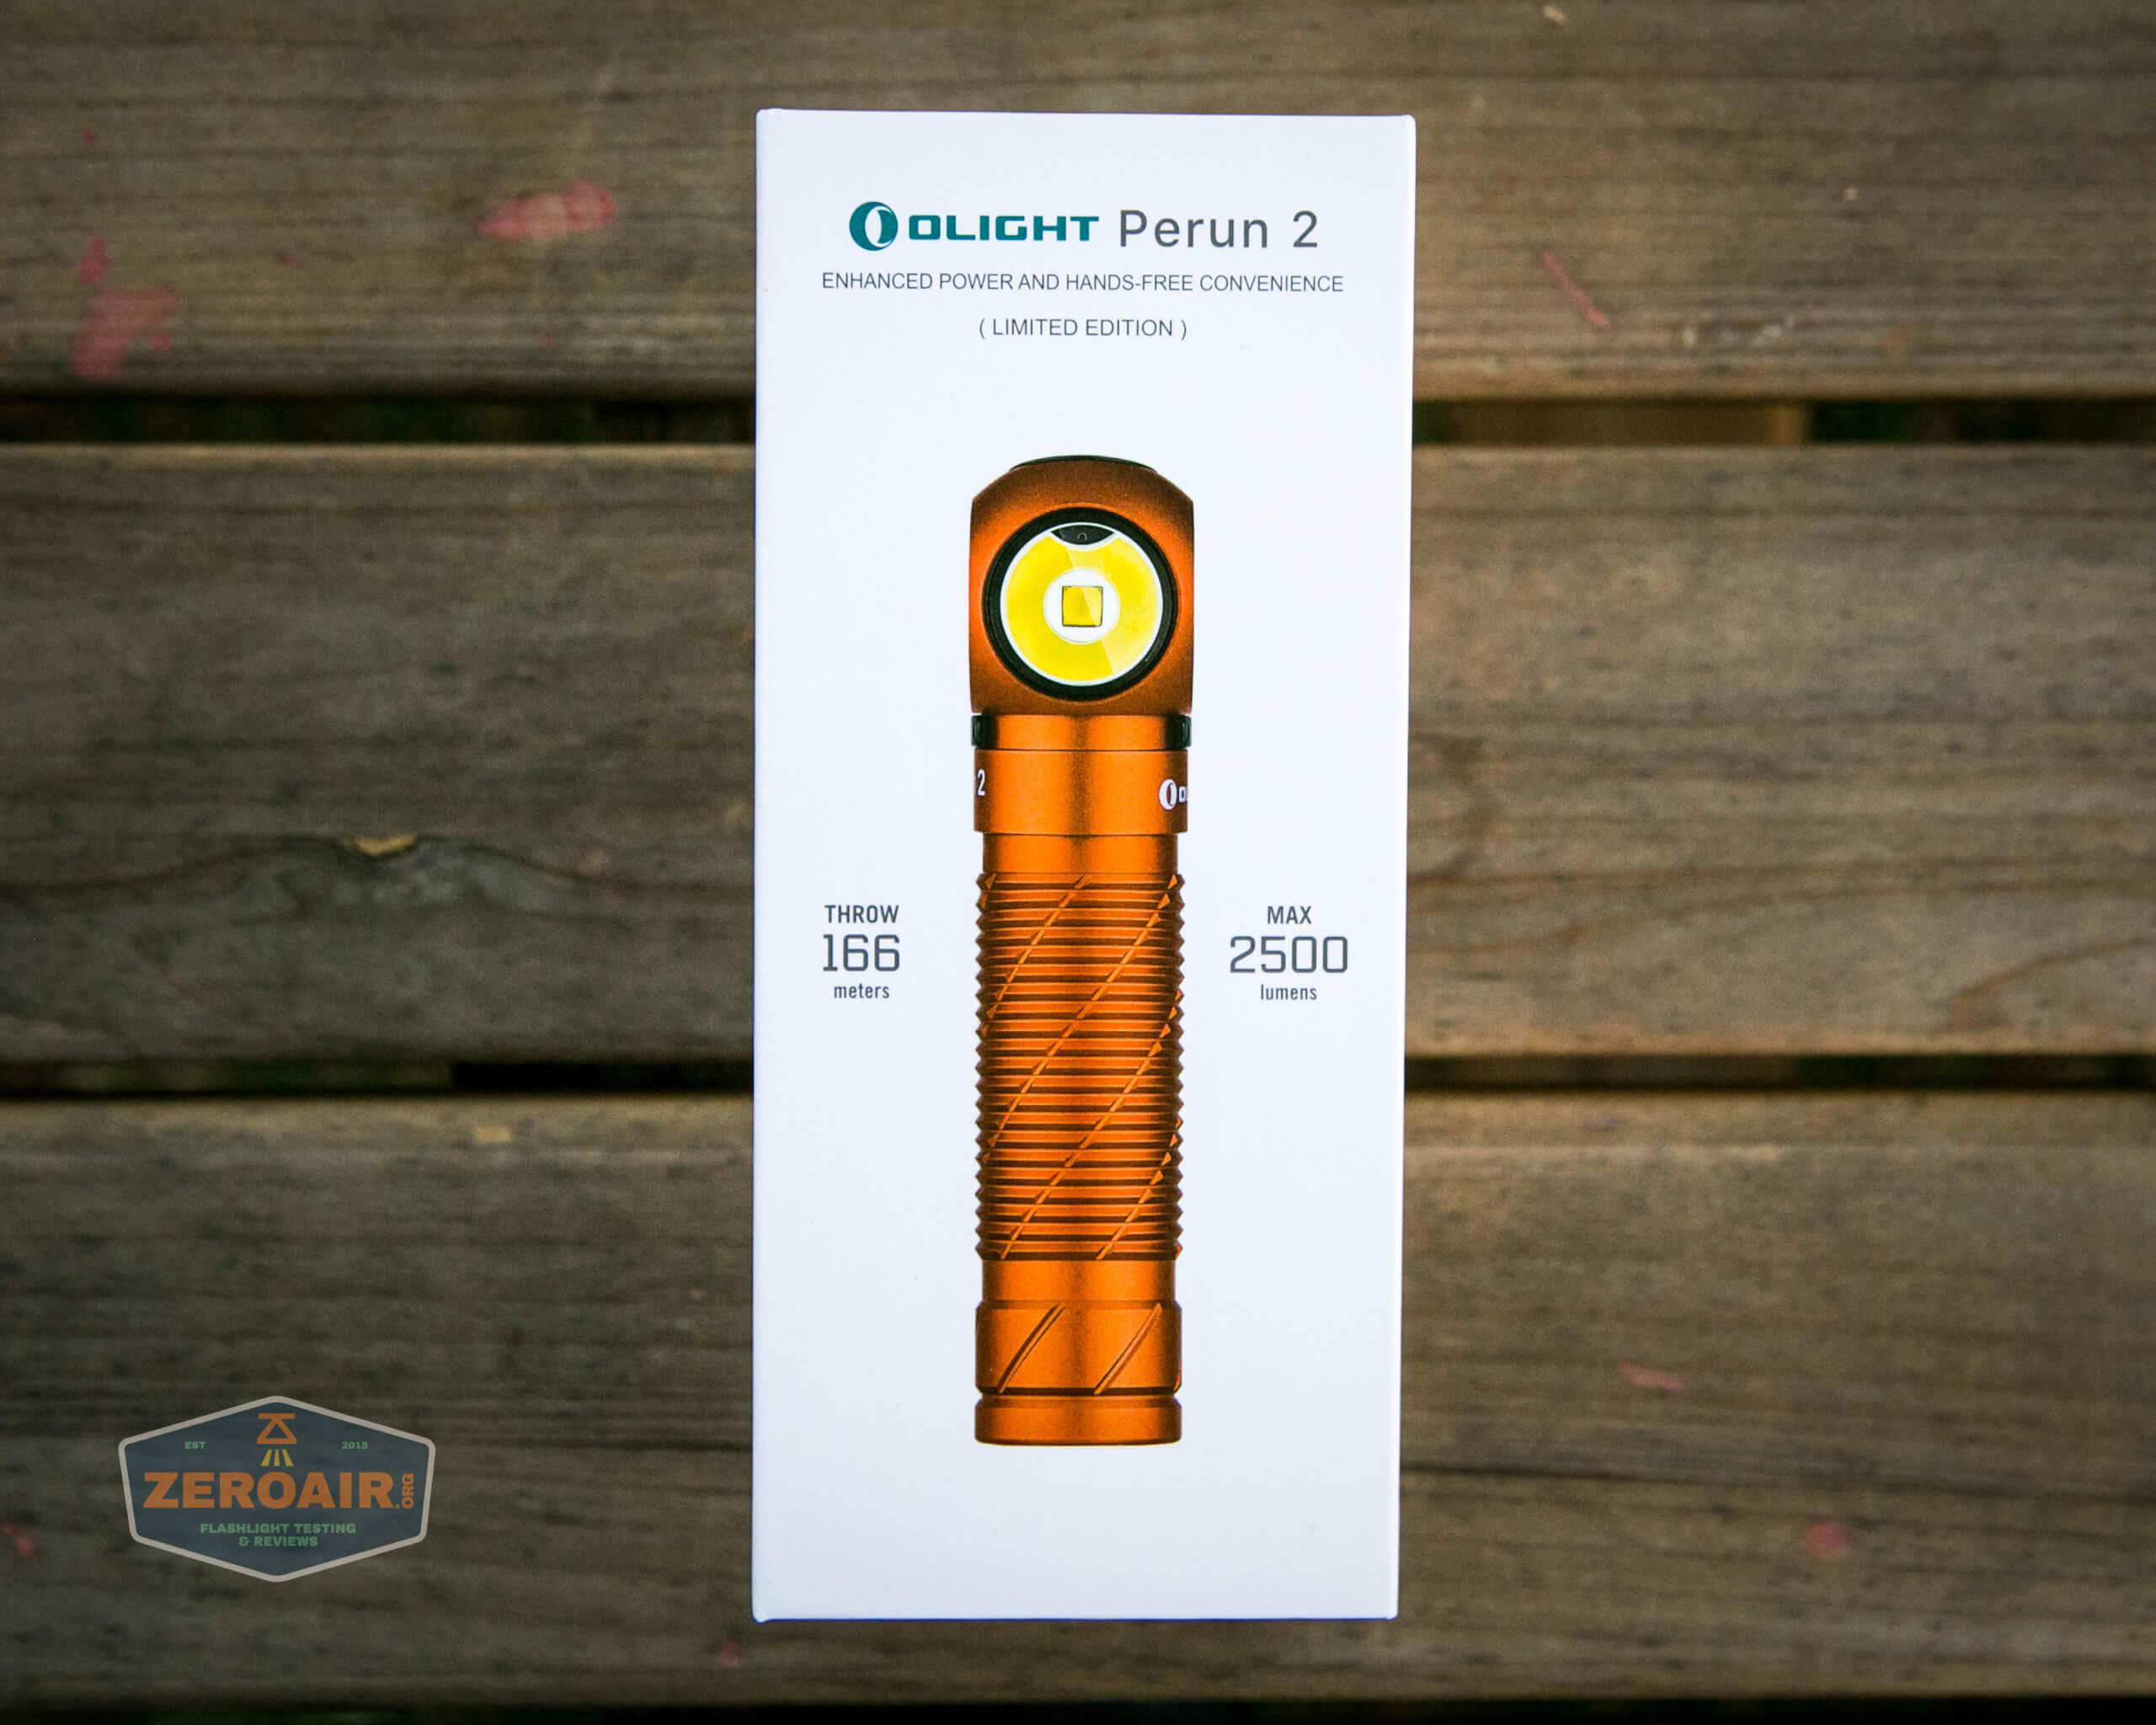 olight perun 2 21700 headlamp orange box